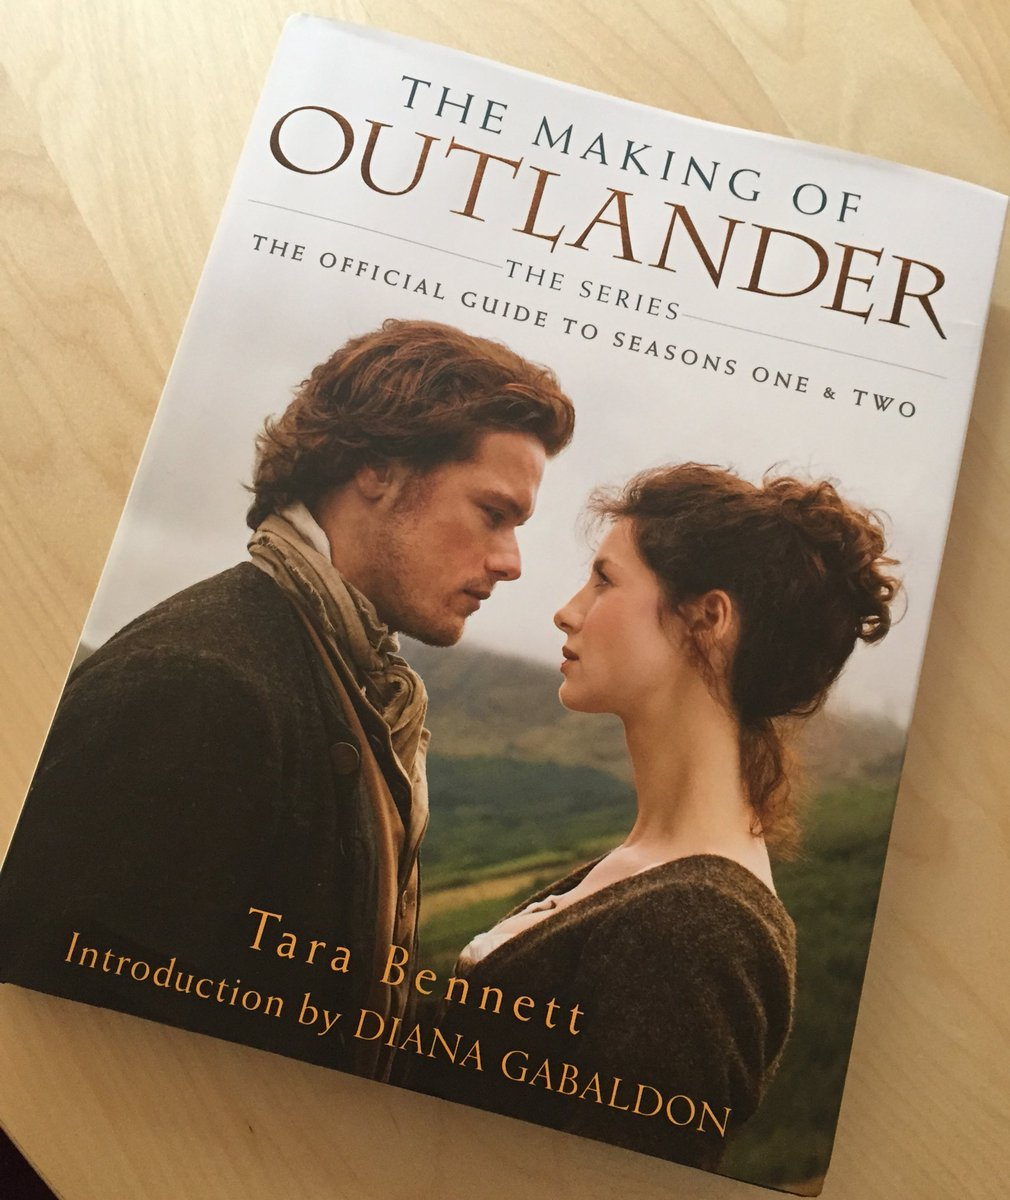 So exciting!! The book is REAL! #OutlanderTVCompanion #comingsoon #Droughtlander #Outlander https://t.co/lZbAGBUEtT